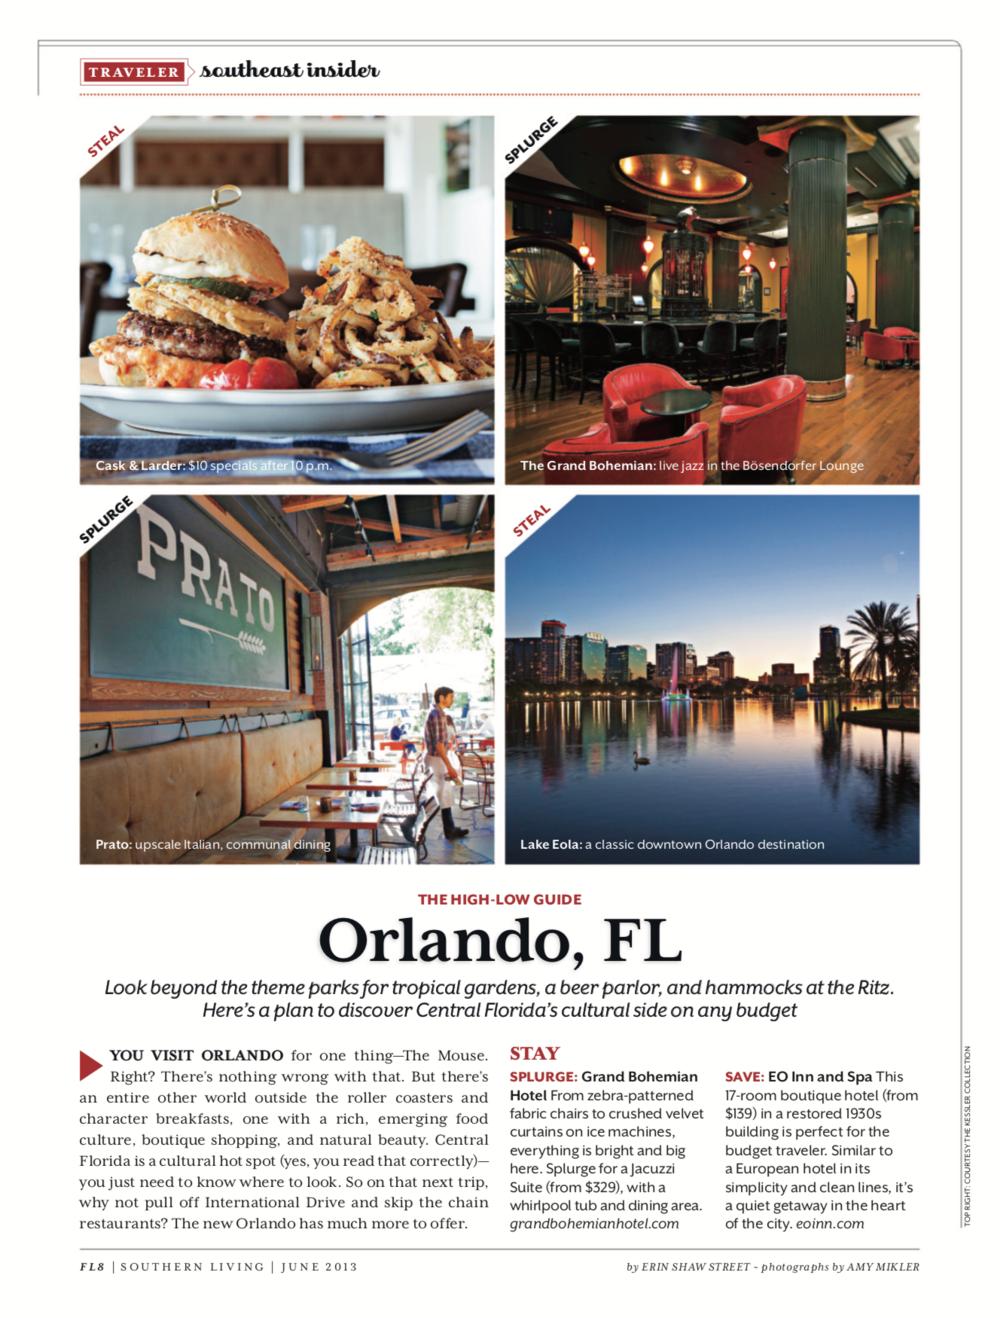 The High-Low Guide: Orlando, Florida